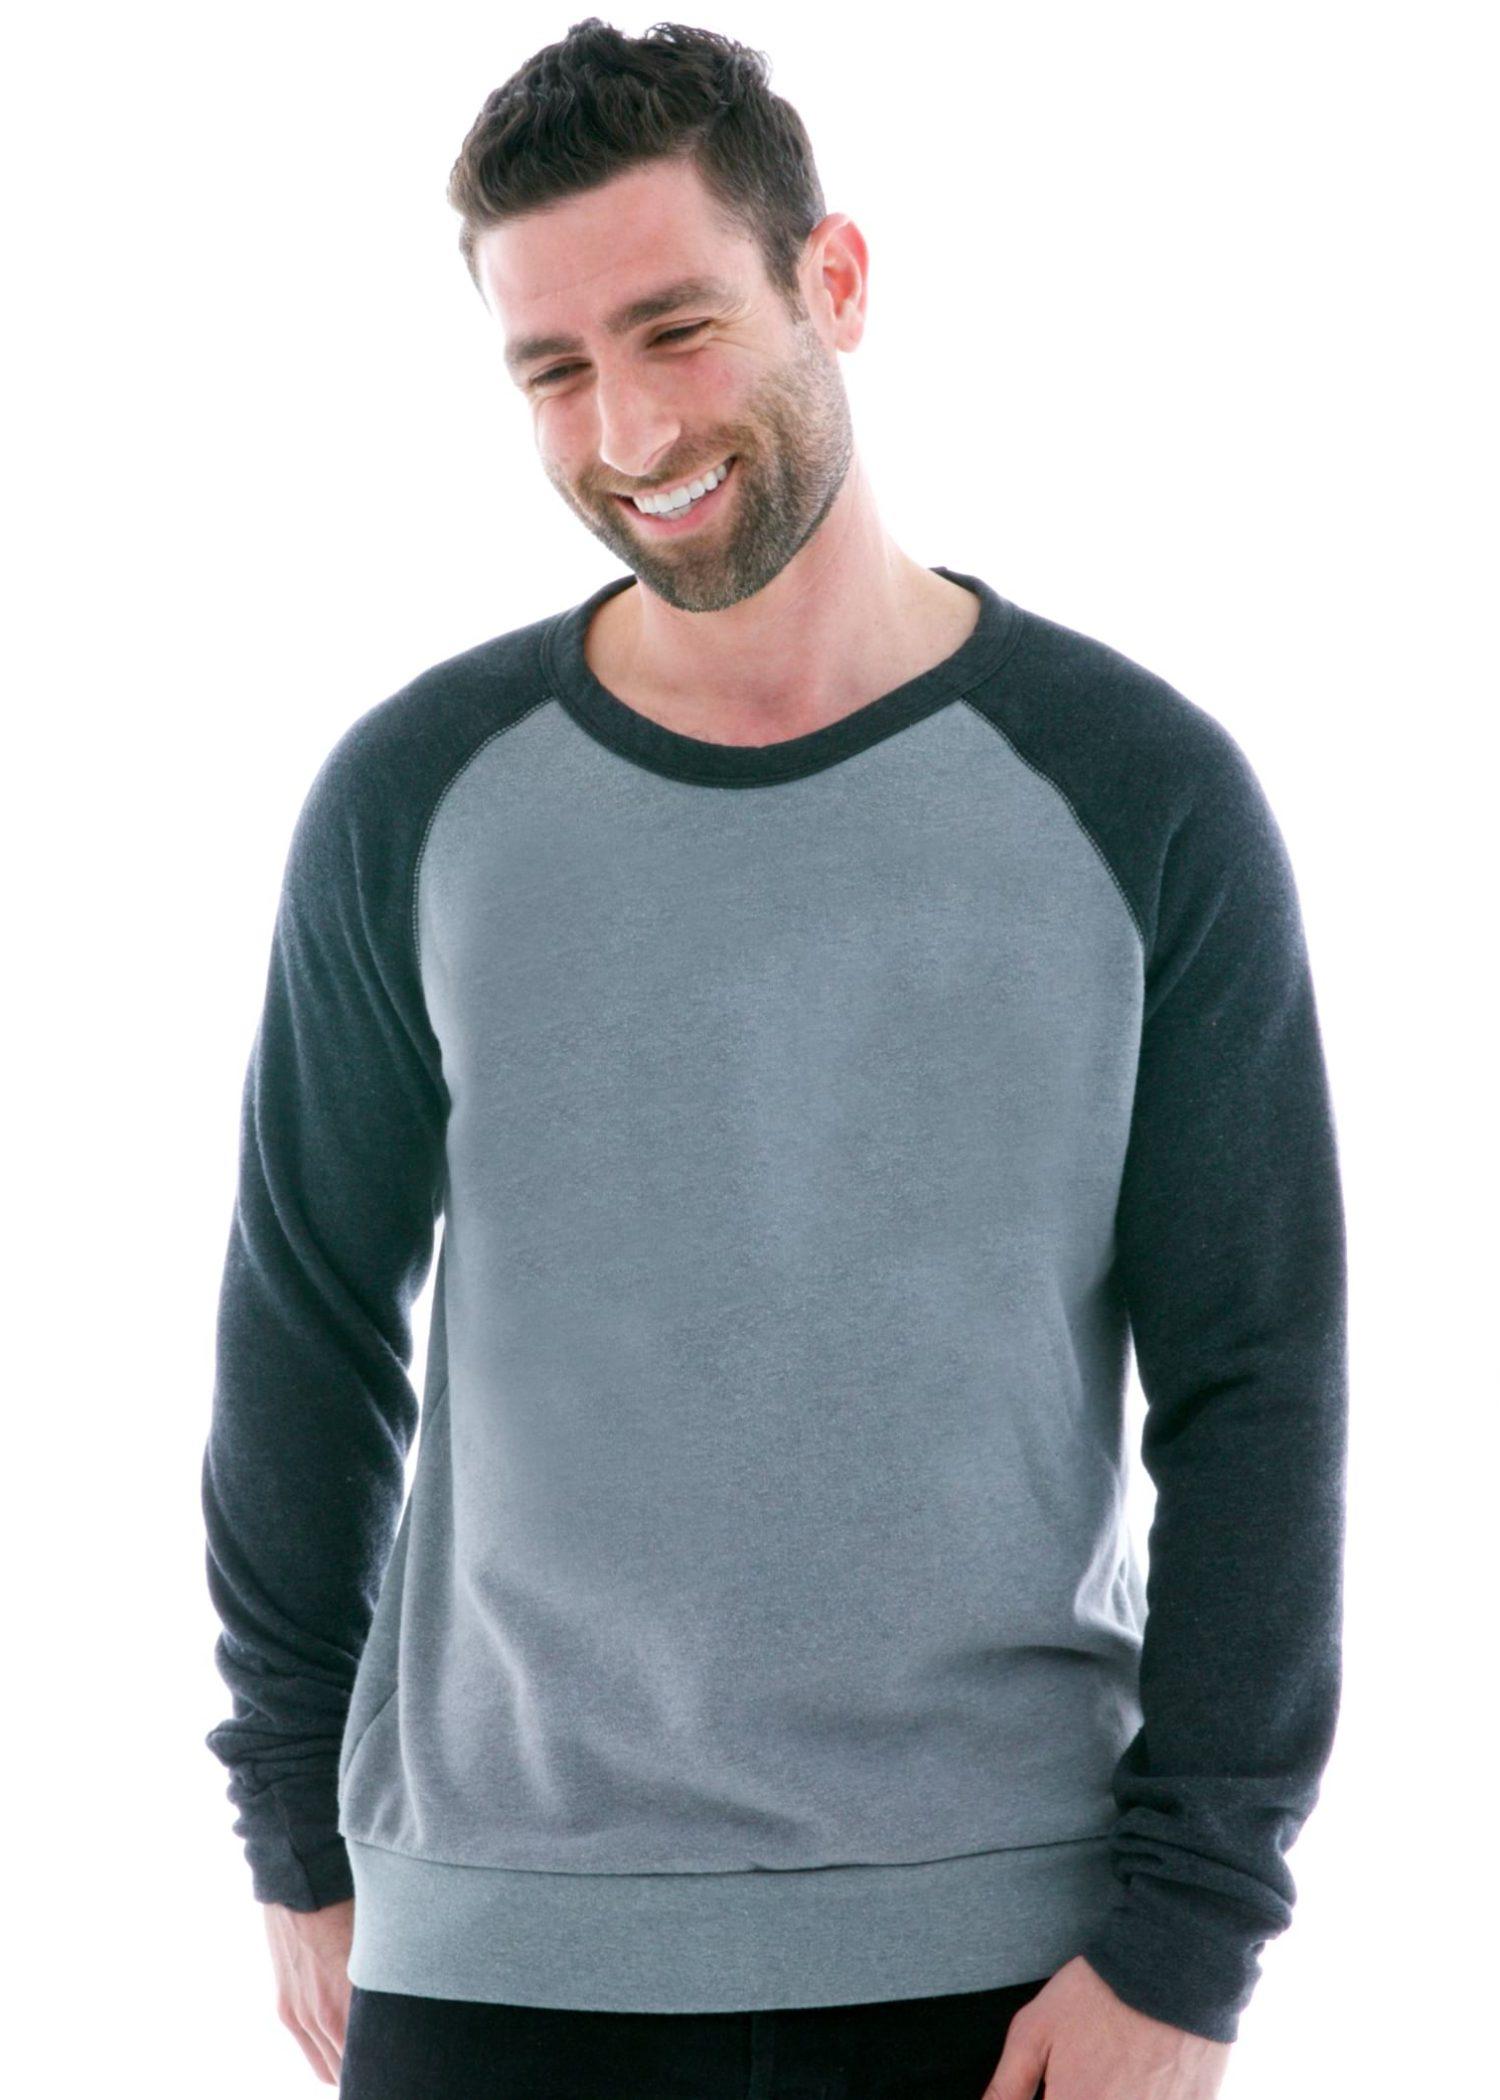 Contrast Sleeve Old School Long Sleeve Raglan T-Shirt Front View